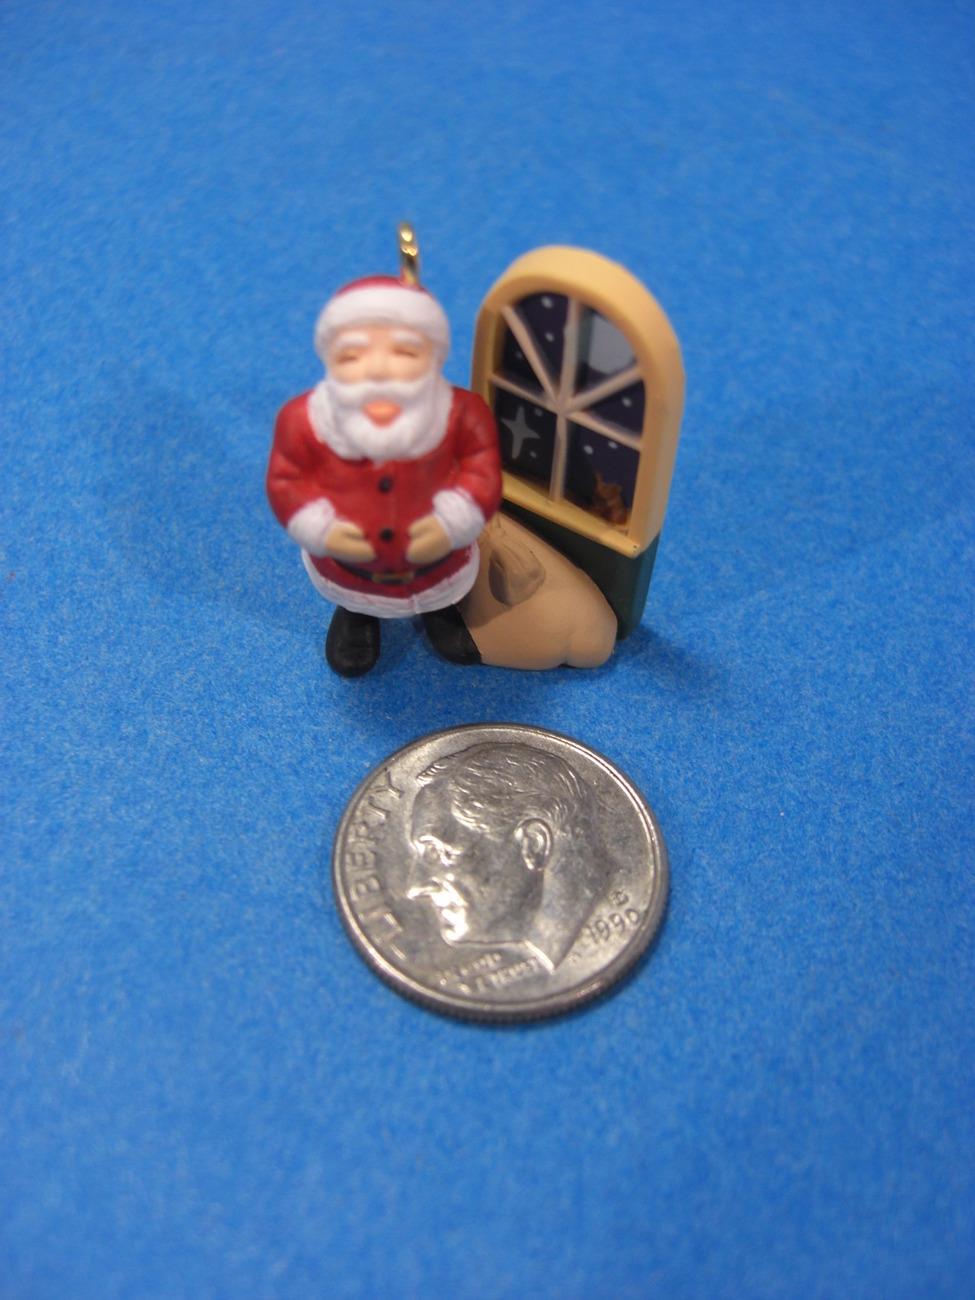 Jolly Old Santa 1997 Miniature Hallmark Christmas Ornament